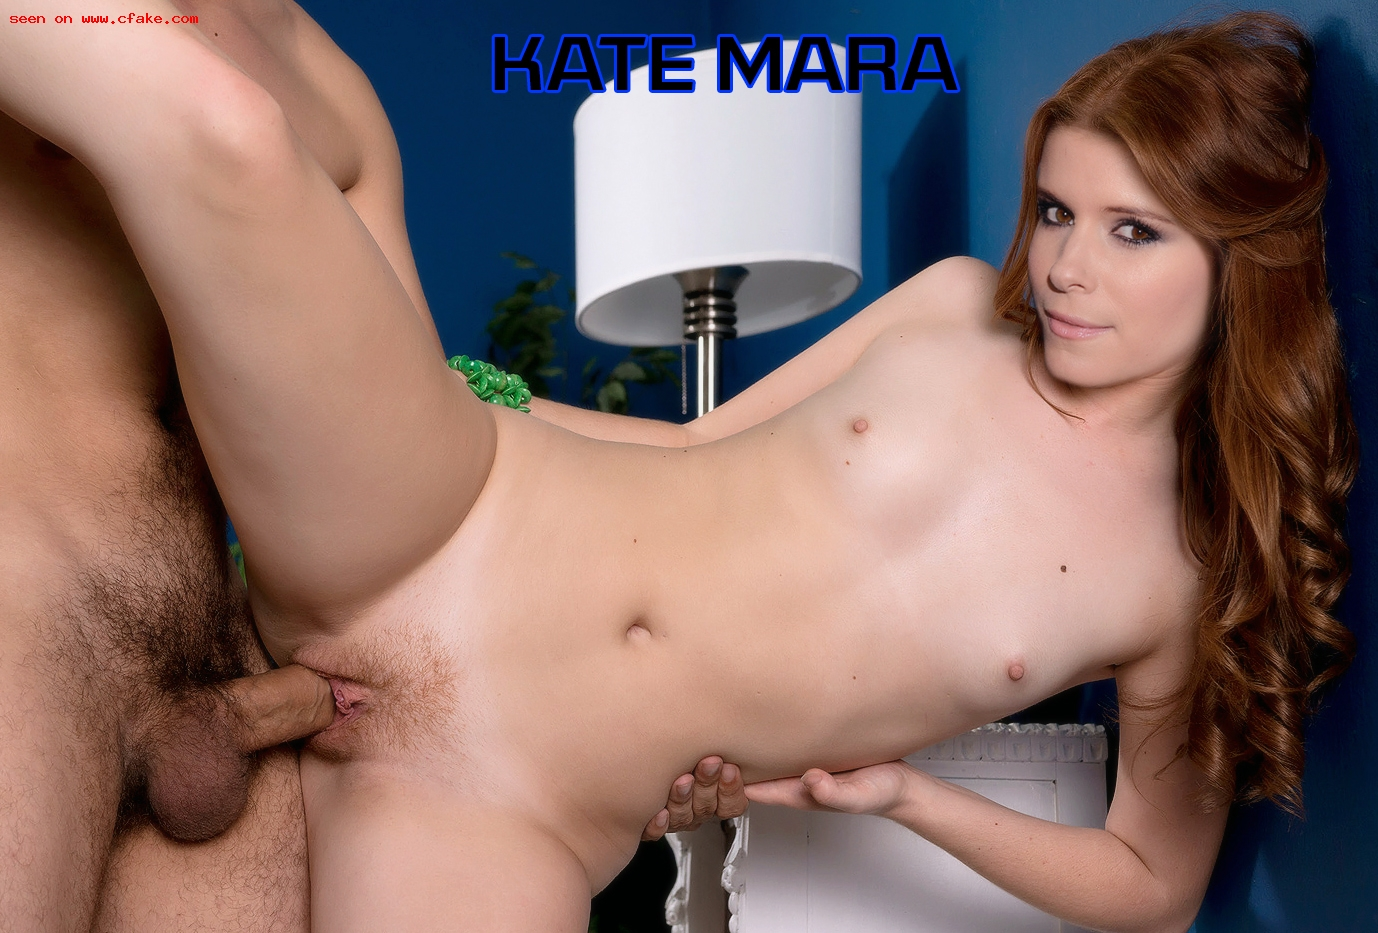 Kate mara porn deepfakes